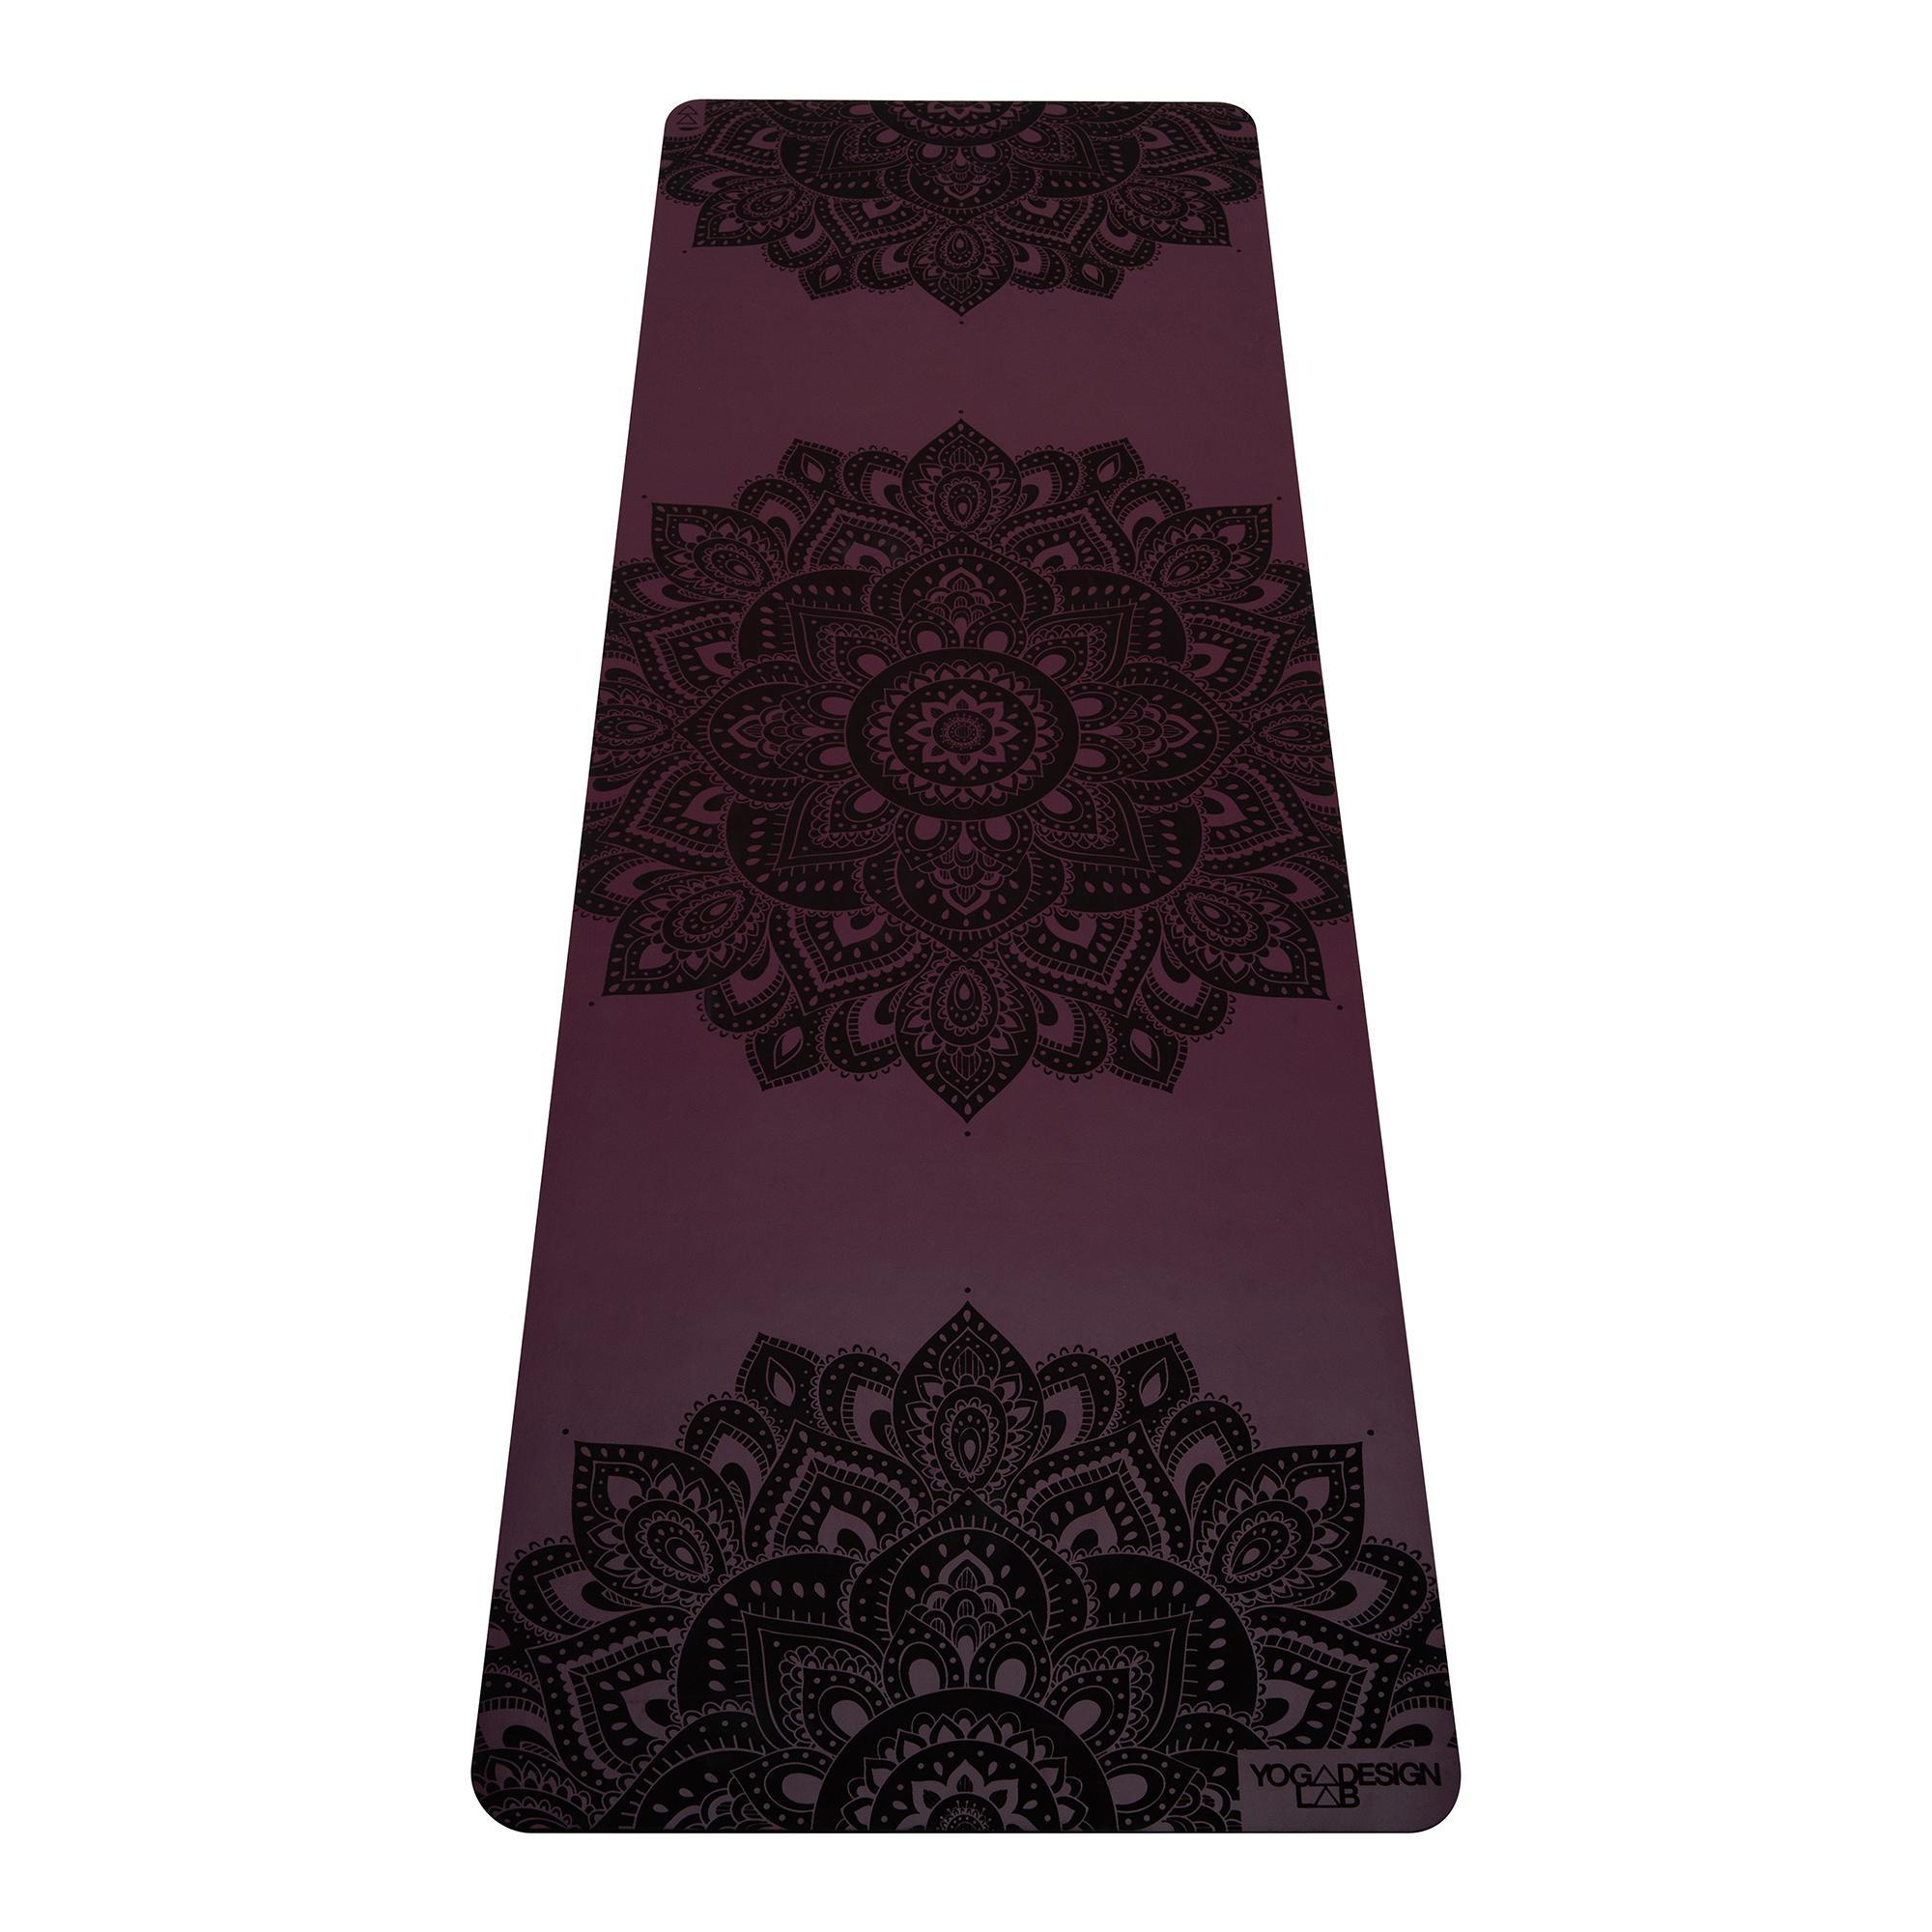 5.0mm Infinity Yoga Mat - Mandala Burgundy